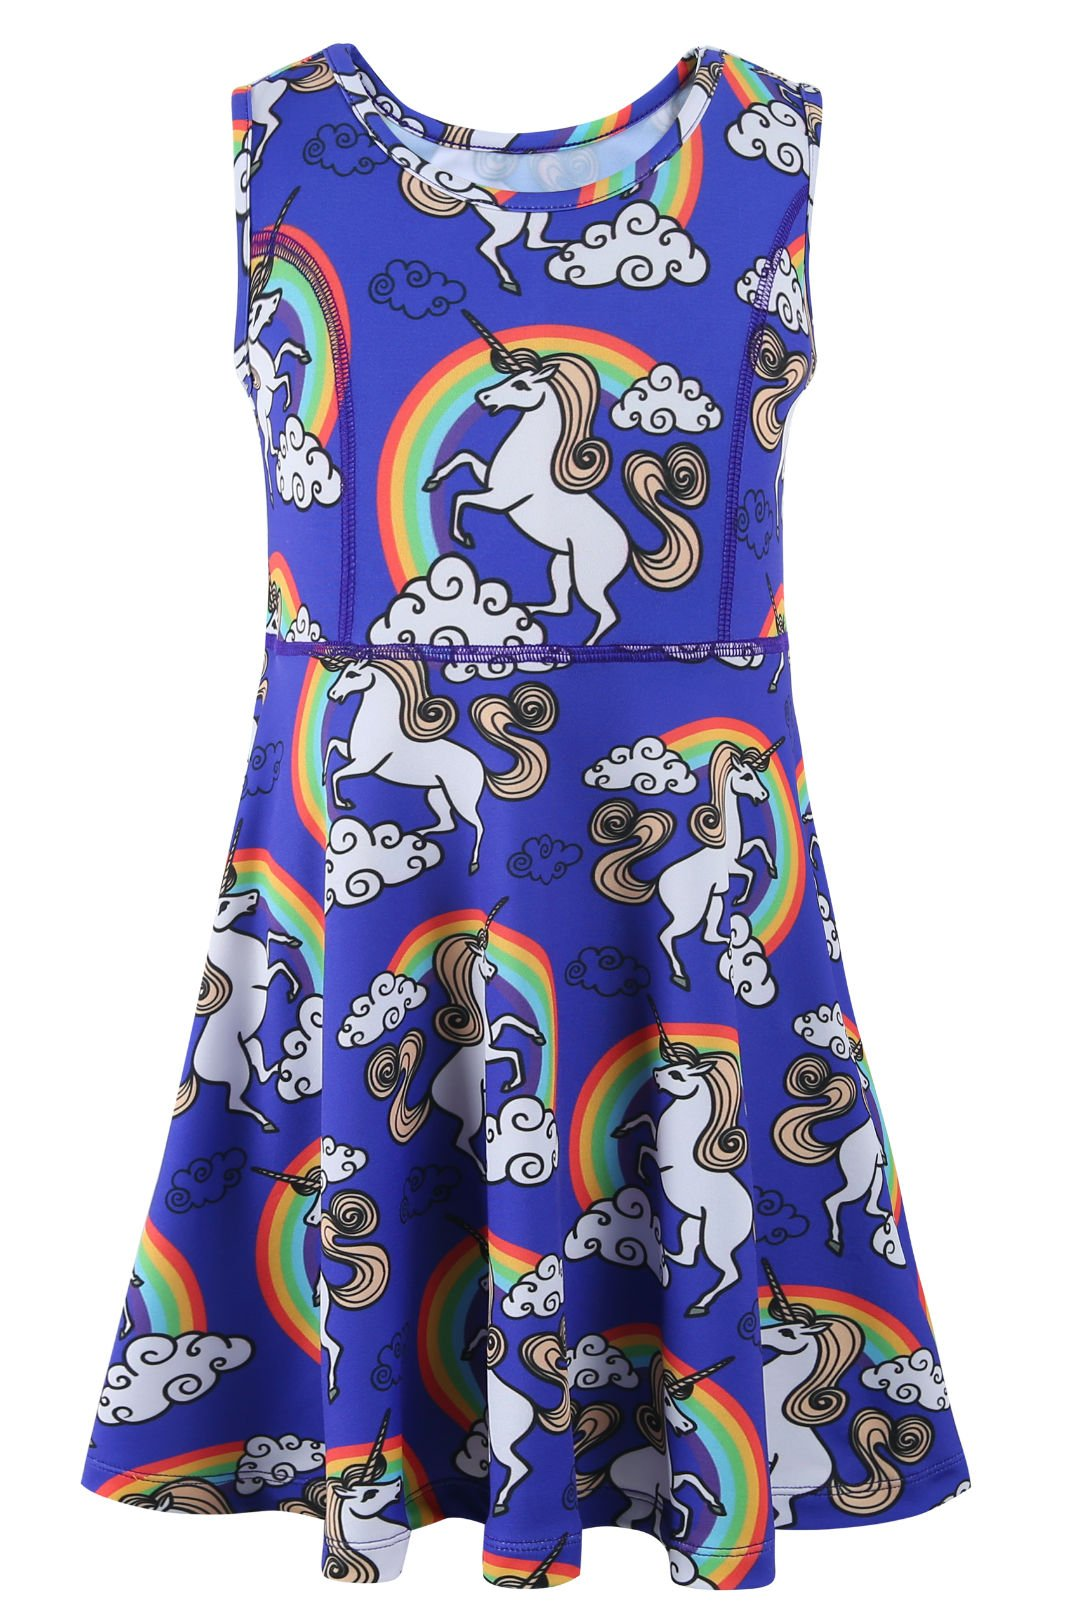 Liliane Green Dress 5t Dresses for Girls 5t Girls Clothes Dress 5t Floral Dress Girls Little Girls Floral Dress (A001,10-11Y)